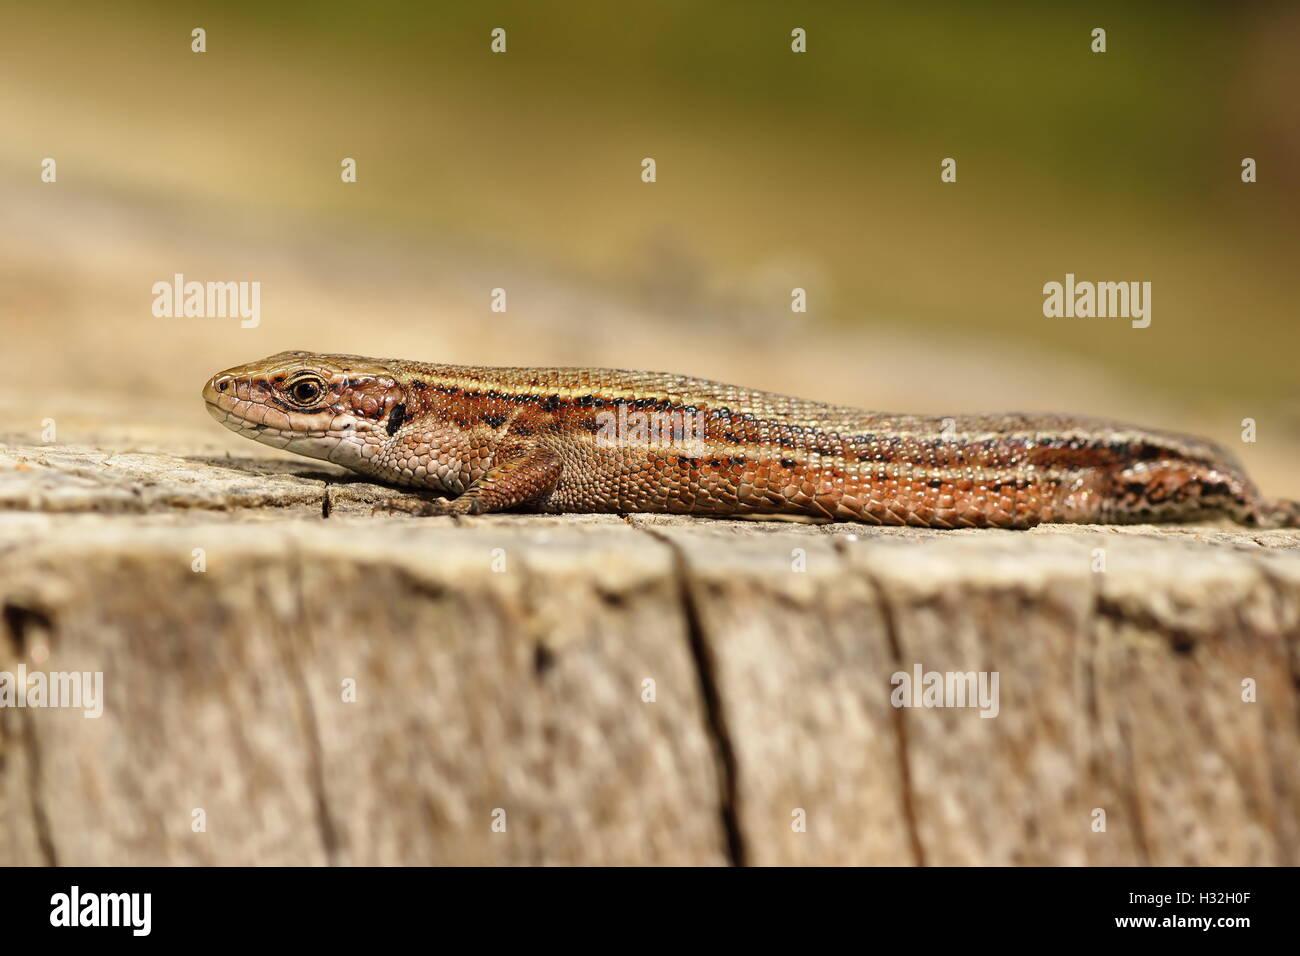 Nahaufnahme von lebendgebärend Eidechse Aalen auf Holz stumpf (Zootoca Vivipara) Stockfoto